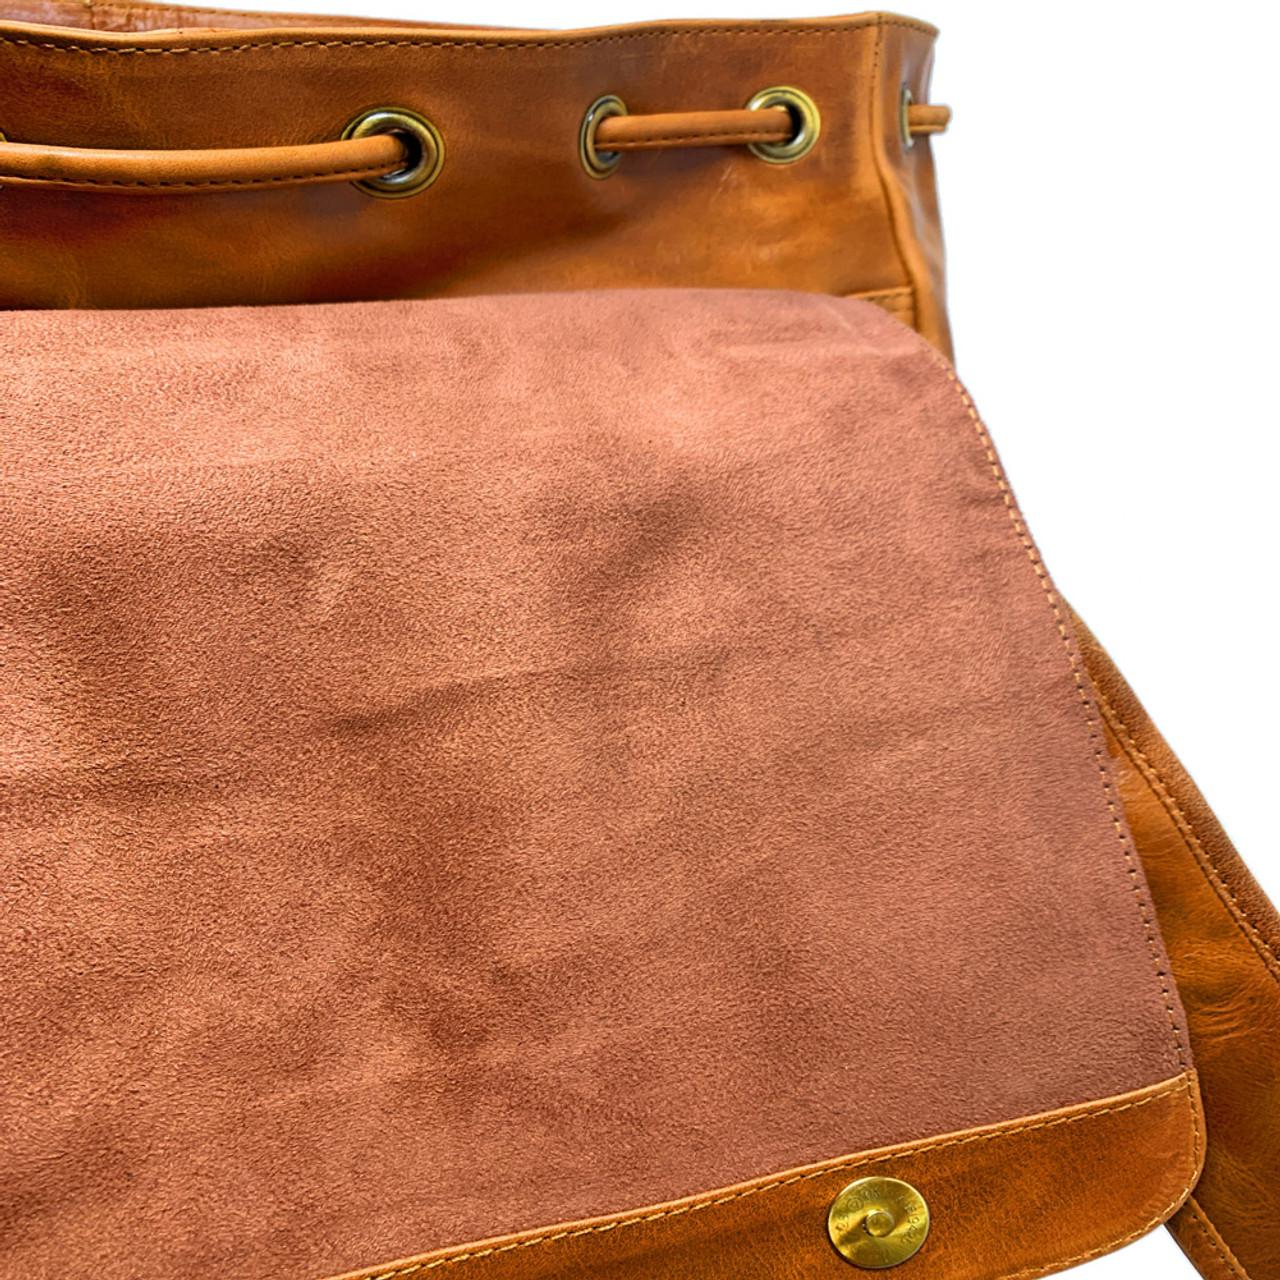 FSU Florida State University Leather Rucksack Tan Westbridge Backpack